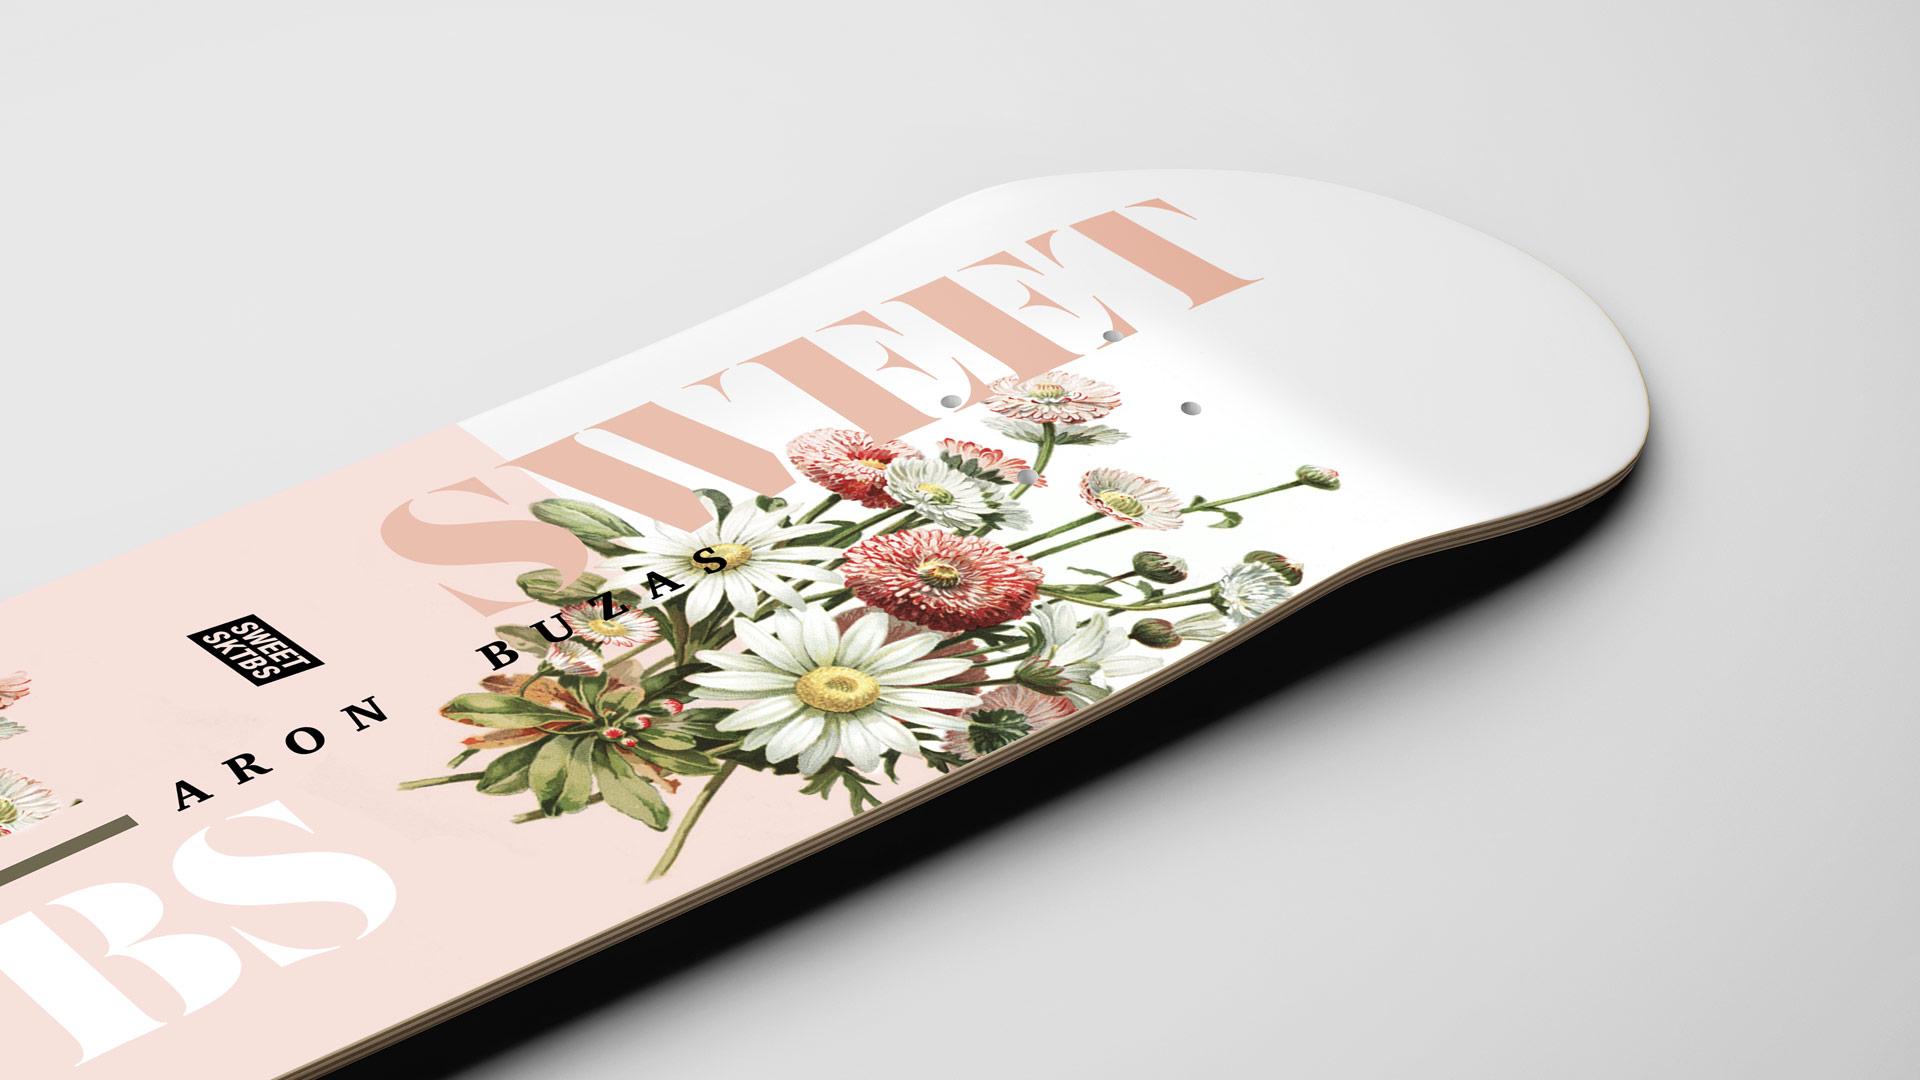 8_deck_skateboards_graphicdesign